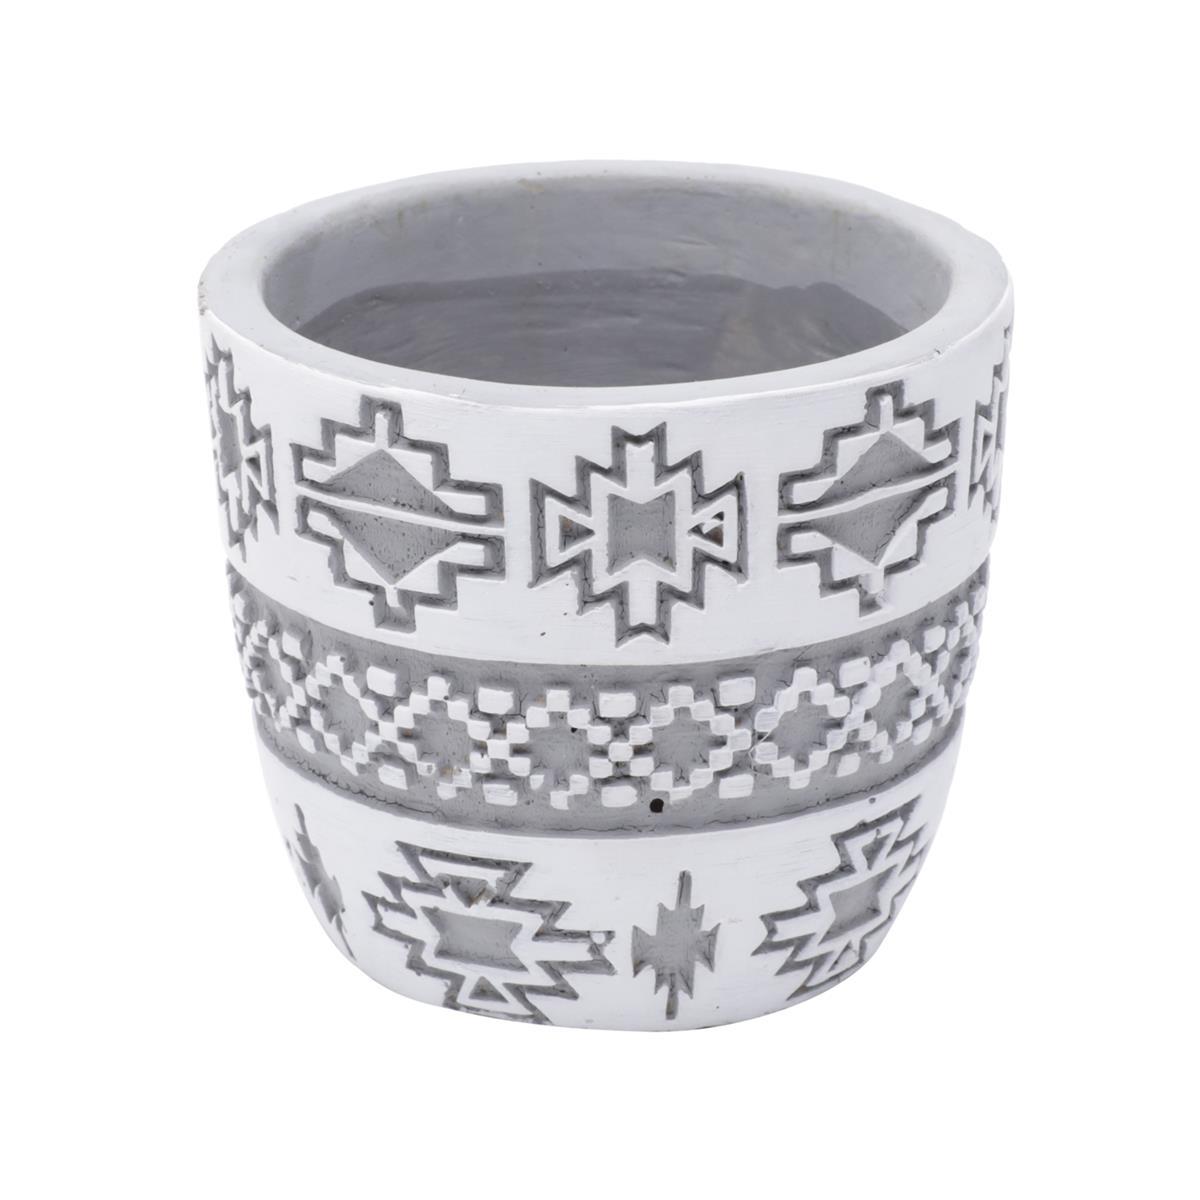 Cachepot concreto Square American Tribal Native cinza/branco 8,5x7,5cm Urban